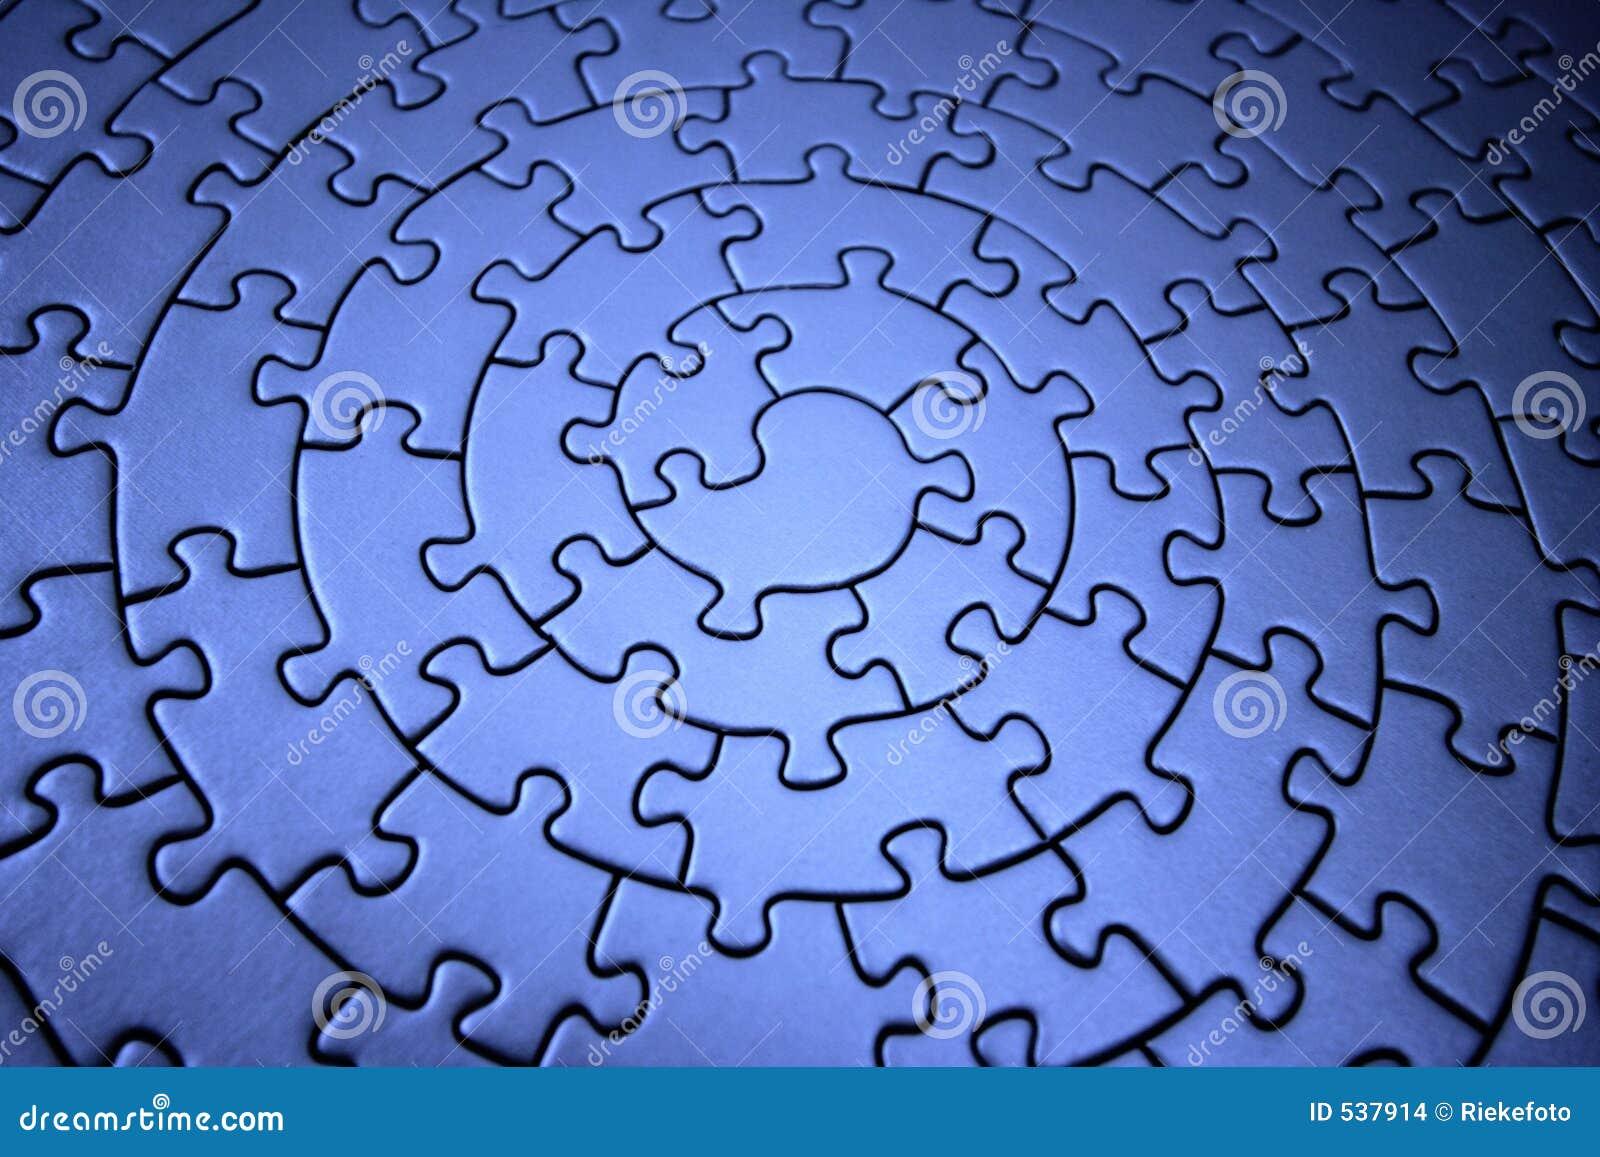 Three-dimensional blue jigsaw